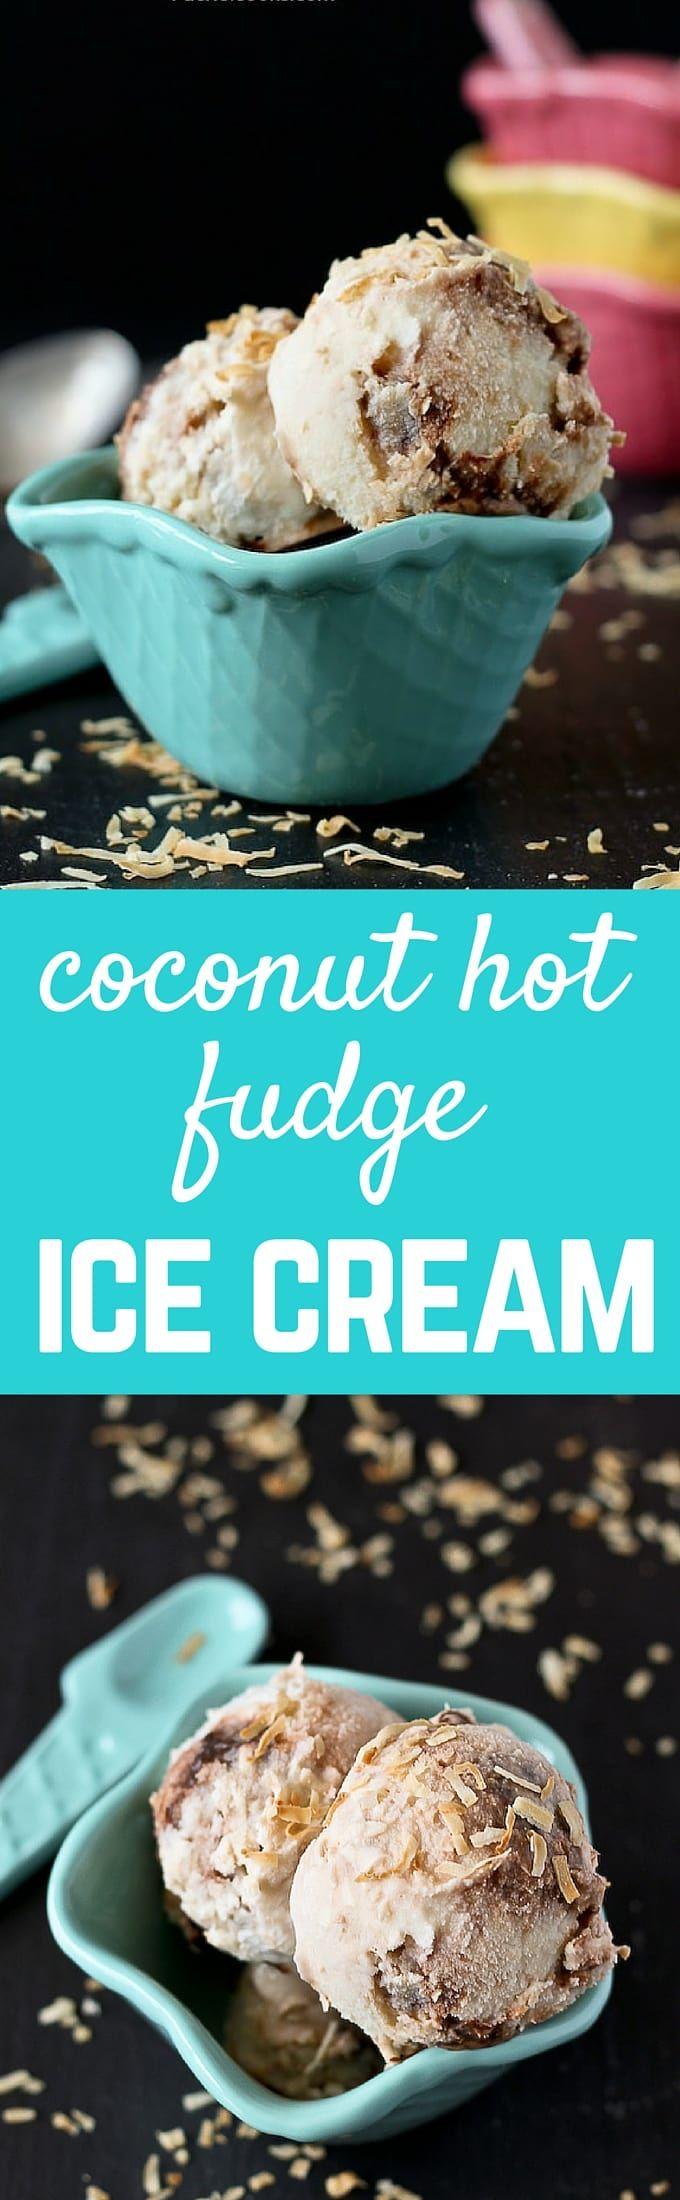 Coconut Hot Fudge Ice Cream - the perfect treat to beat the heat! Get the recipe on RachelCooks.com!